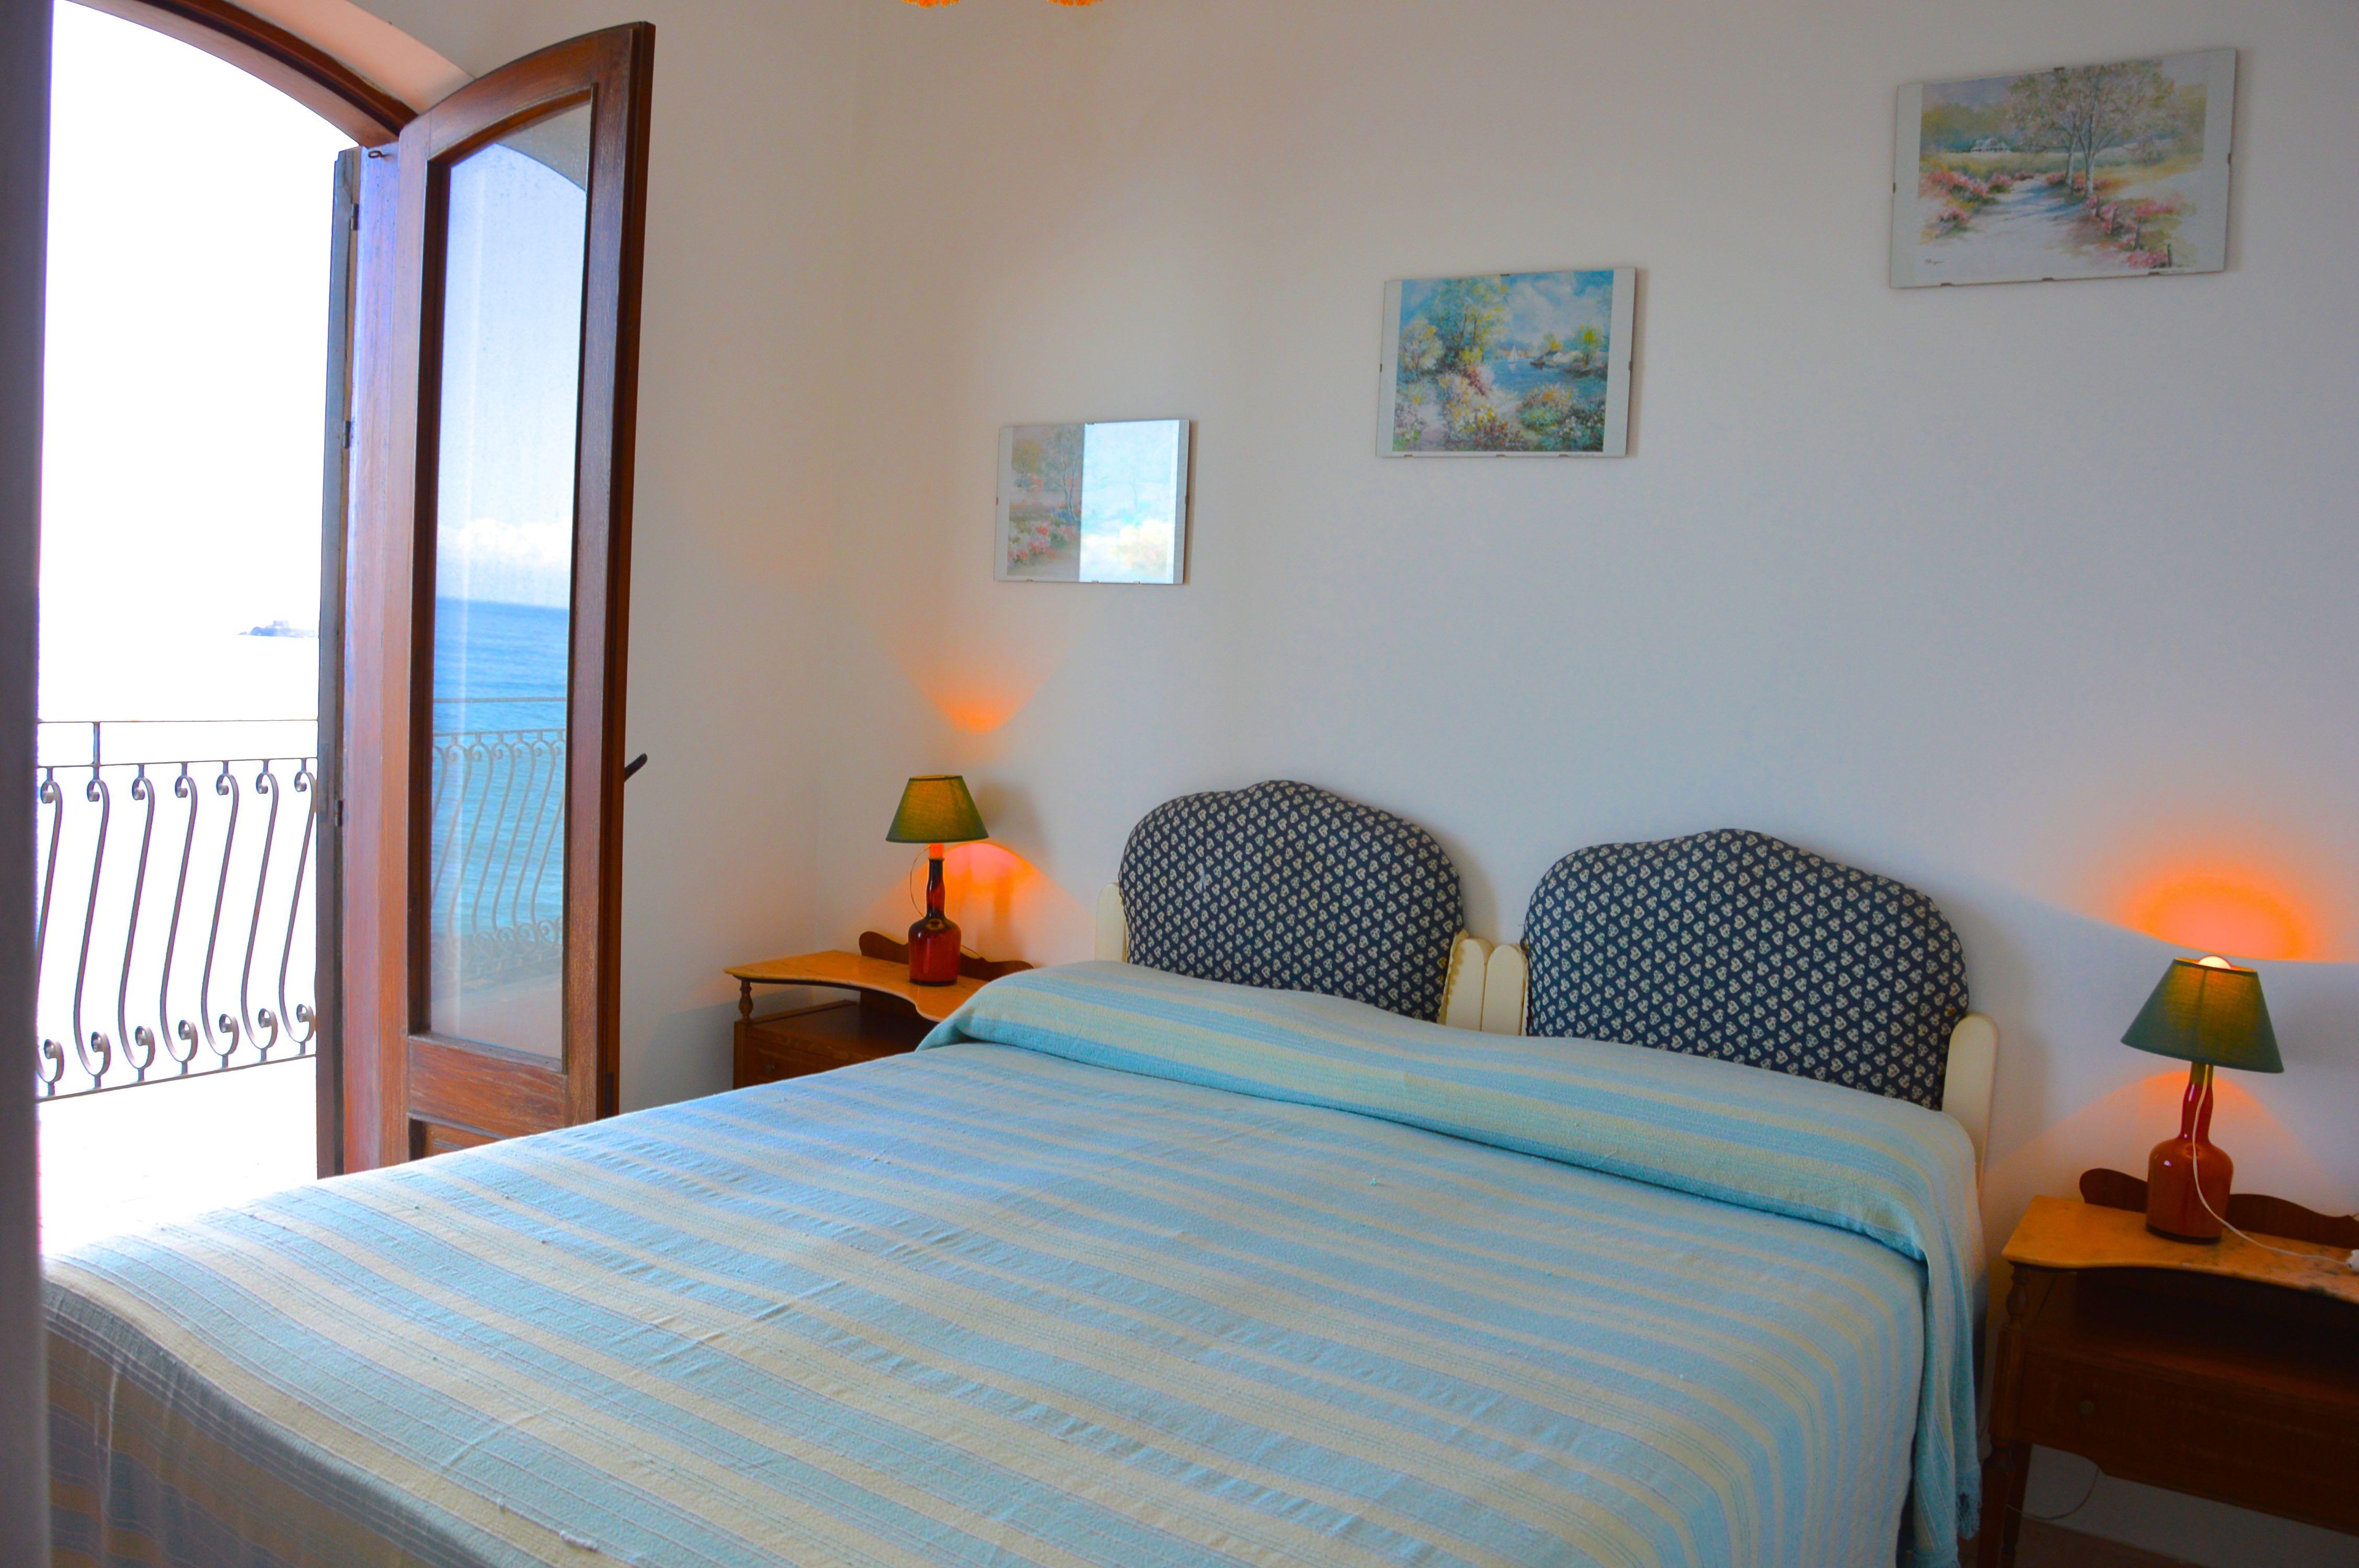 Holiday apartment Casa Camelia - Apartment in front of the beach in Giardini Naxos (1976978), Giardini Naxos, Messina, Sicily, Italy, picture 10